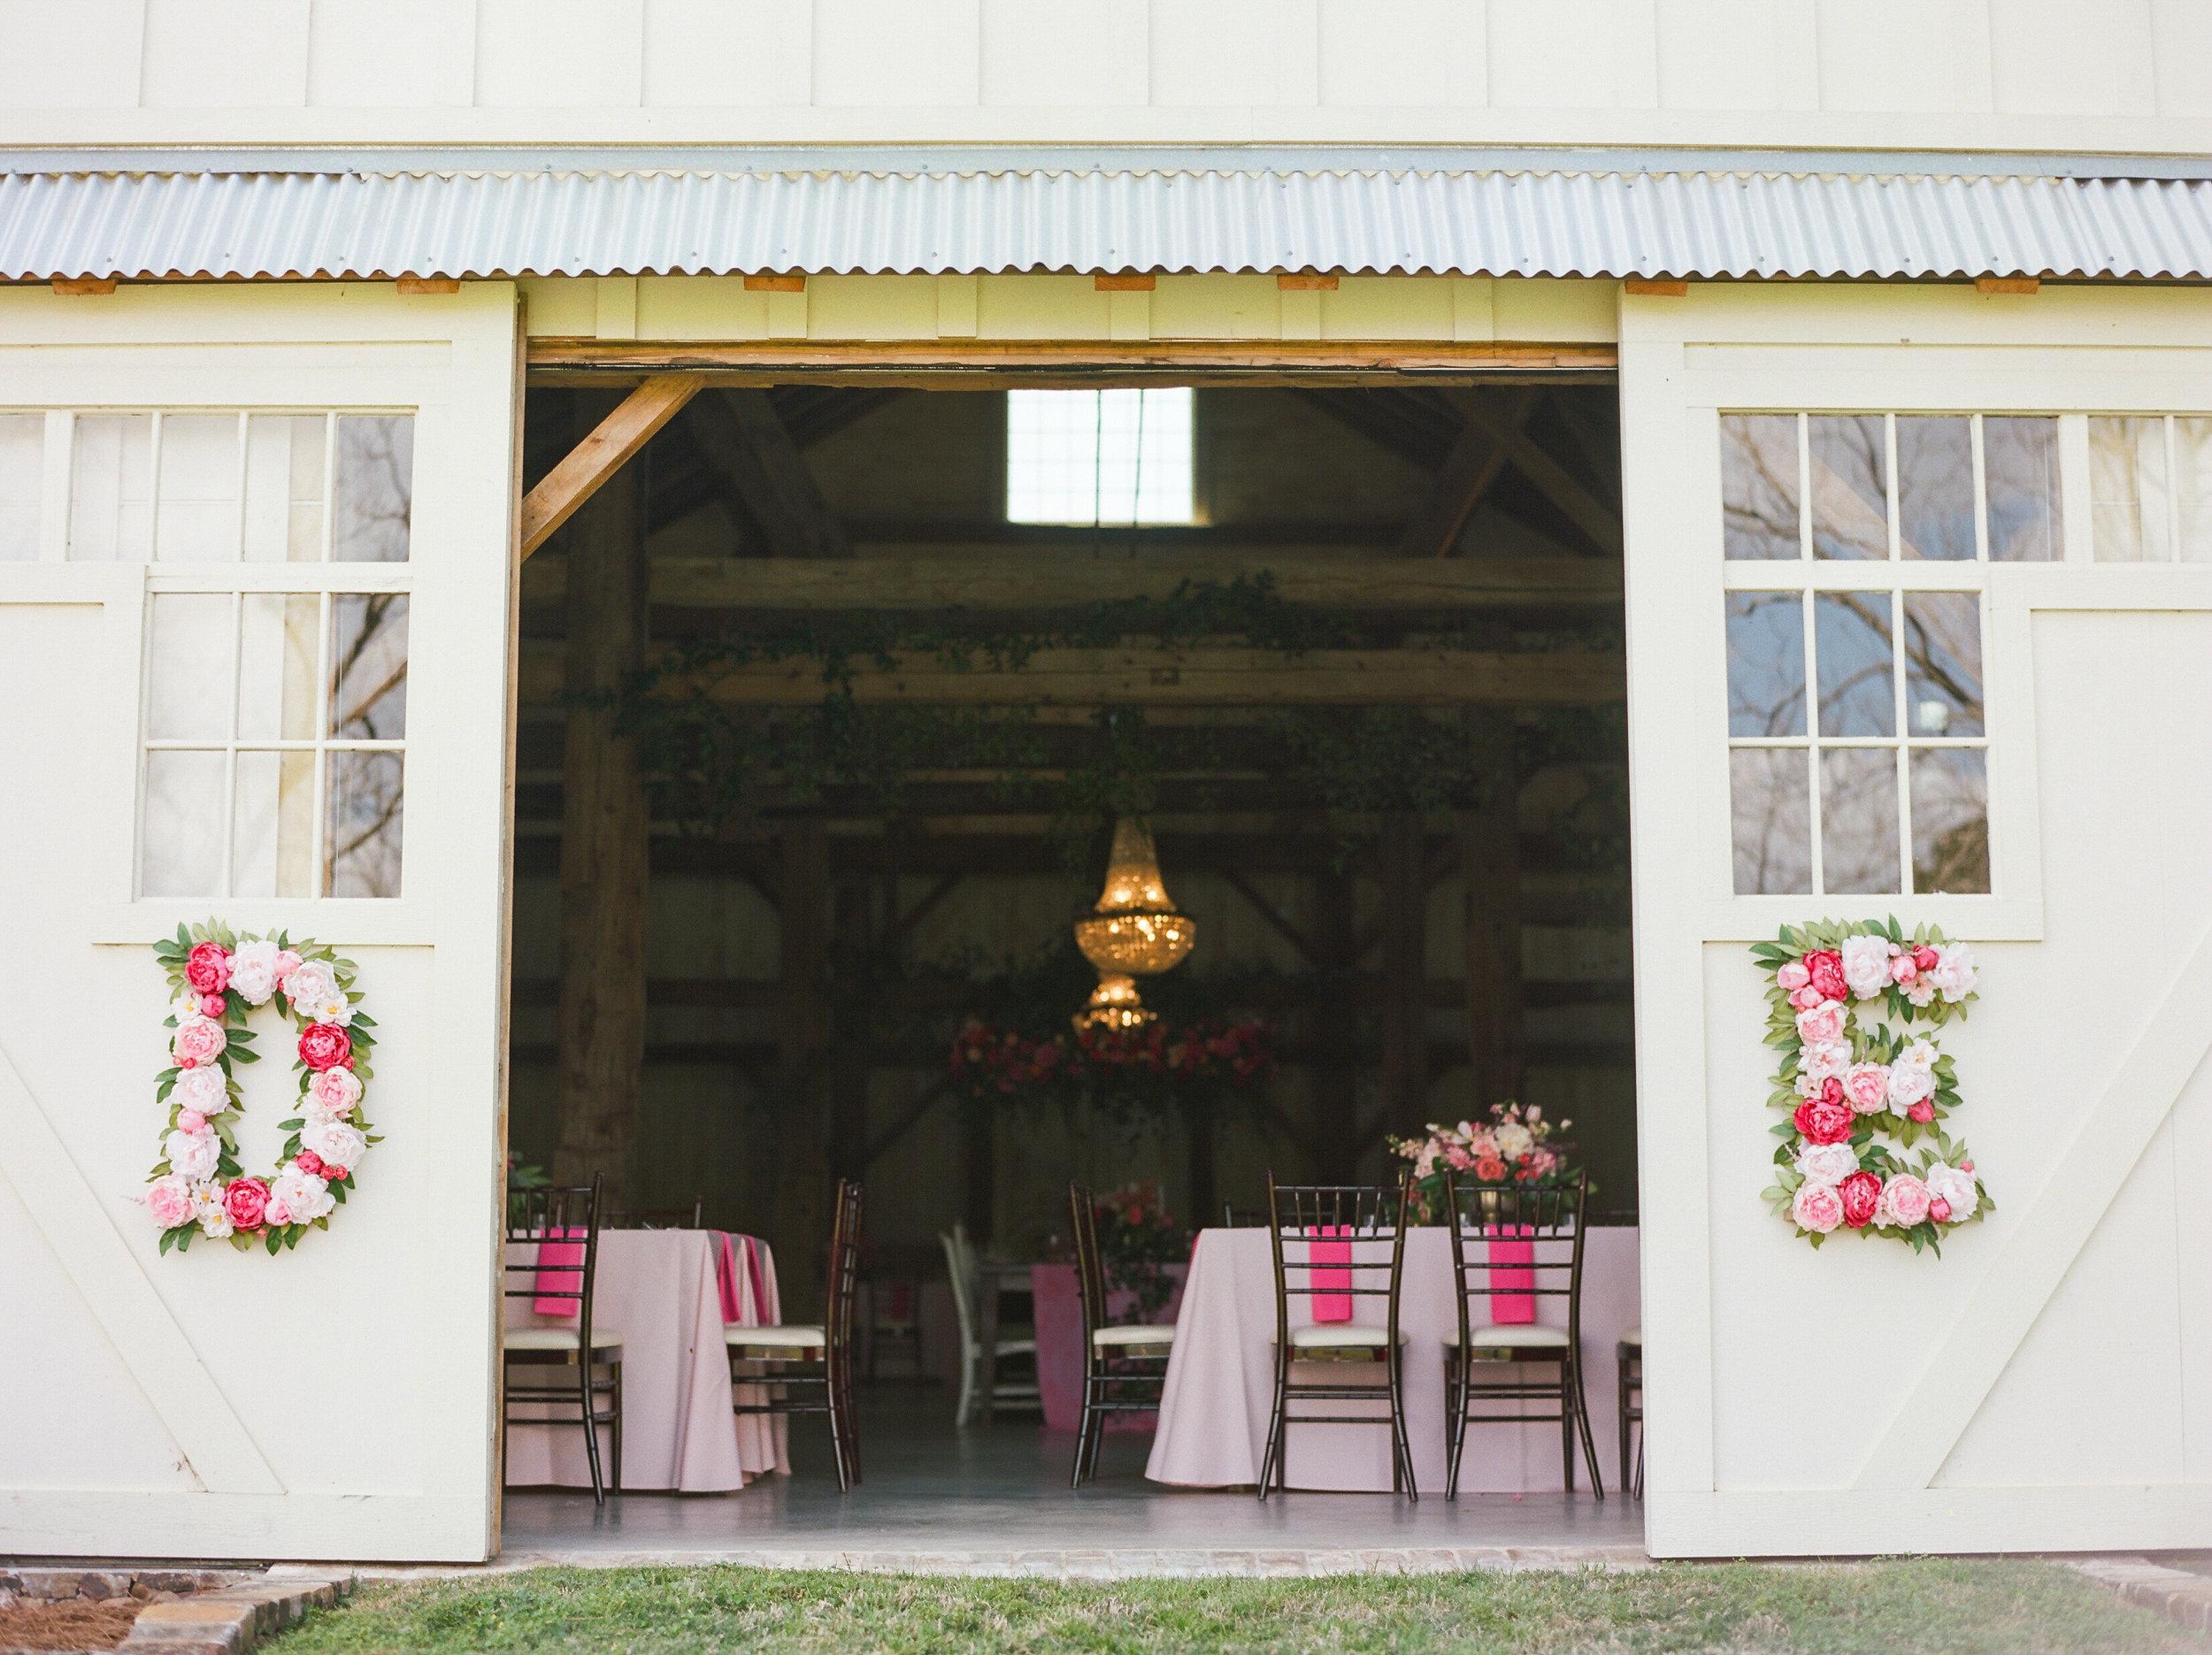 The-Knot-50-Weddings-50-States-Texas-Winner-Dana-Fernandez-photography-houston-wedding-photographer-film-fine-art-destination-33.jpg